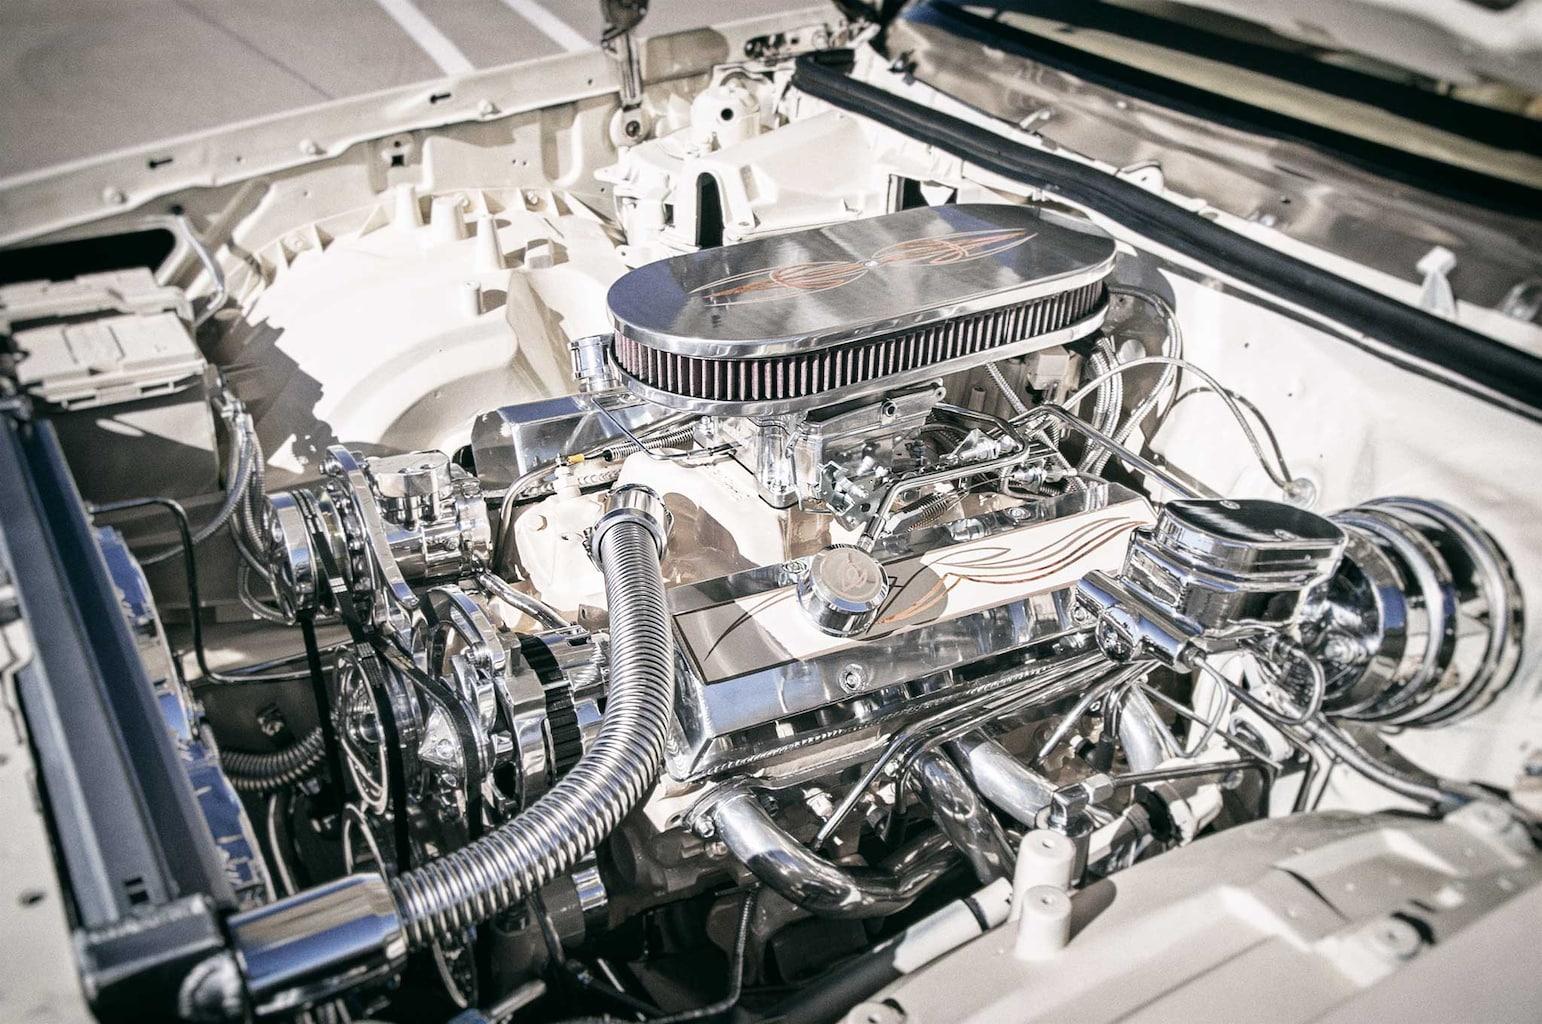 1985 oldsmobile cutlass supreme 350 small block crate motor 022